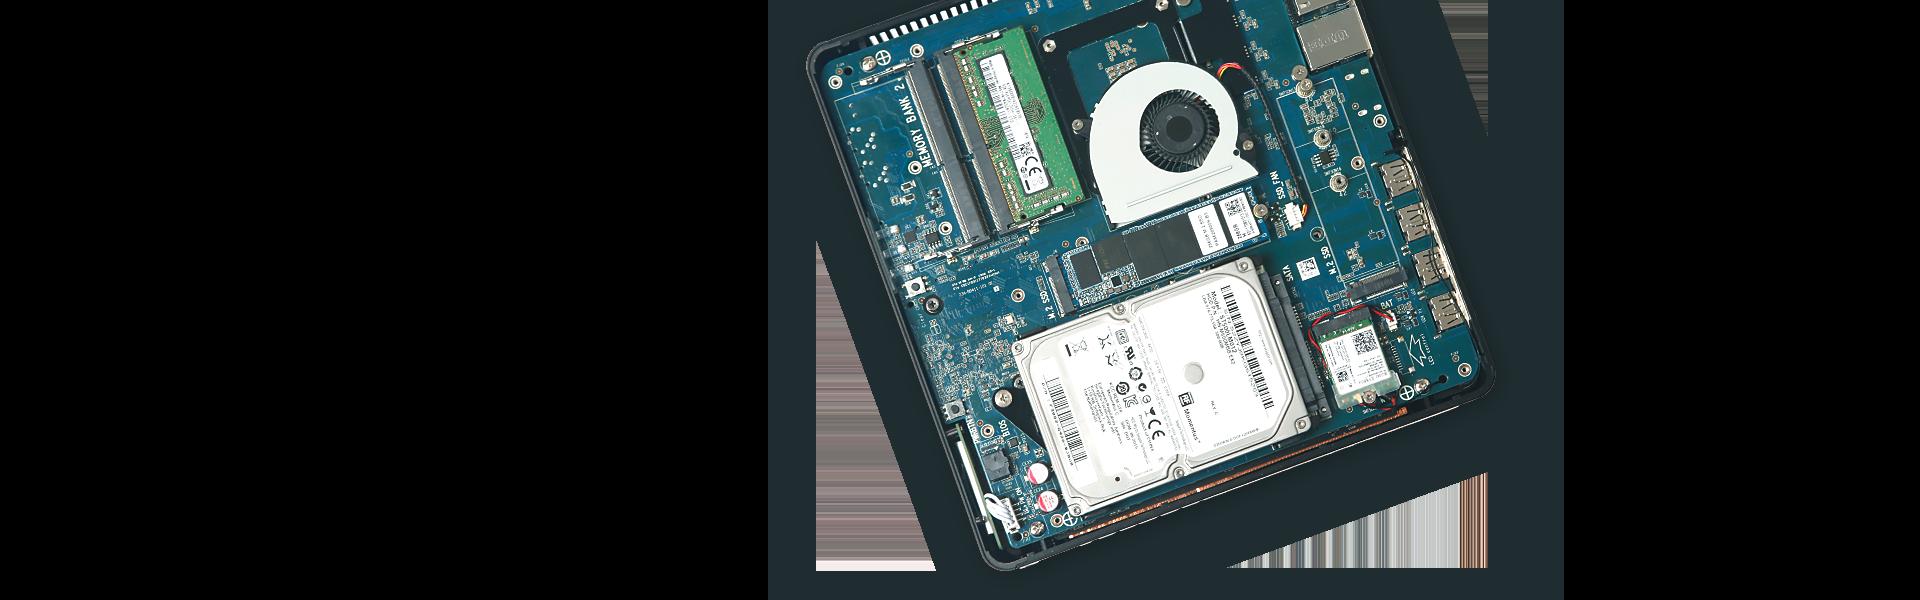 ZOTAC - Mini PCs and GeForce GTX Gaming Graphics Cards | ZOTAC